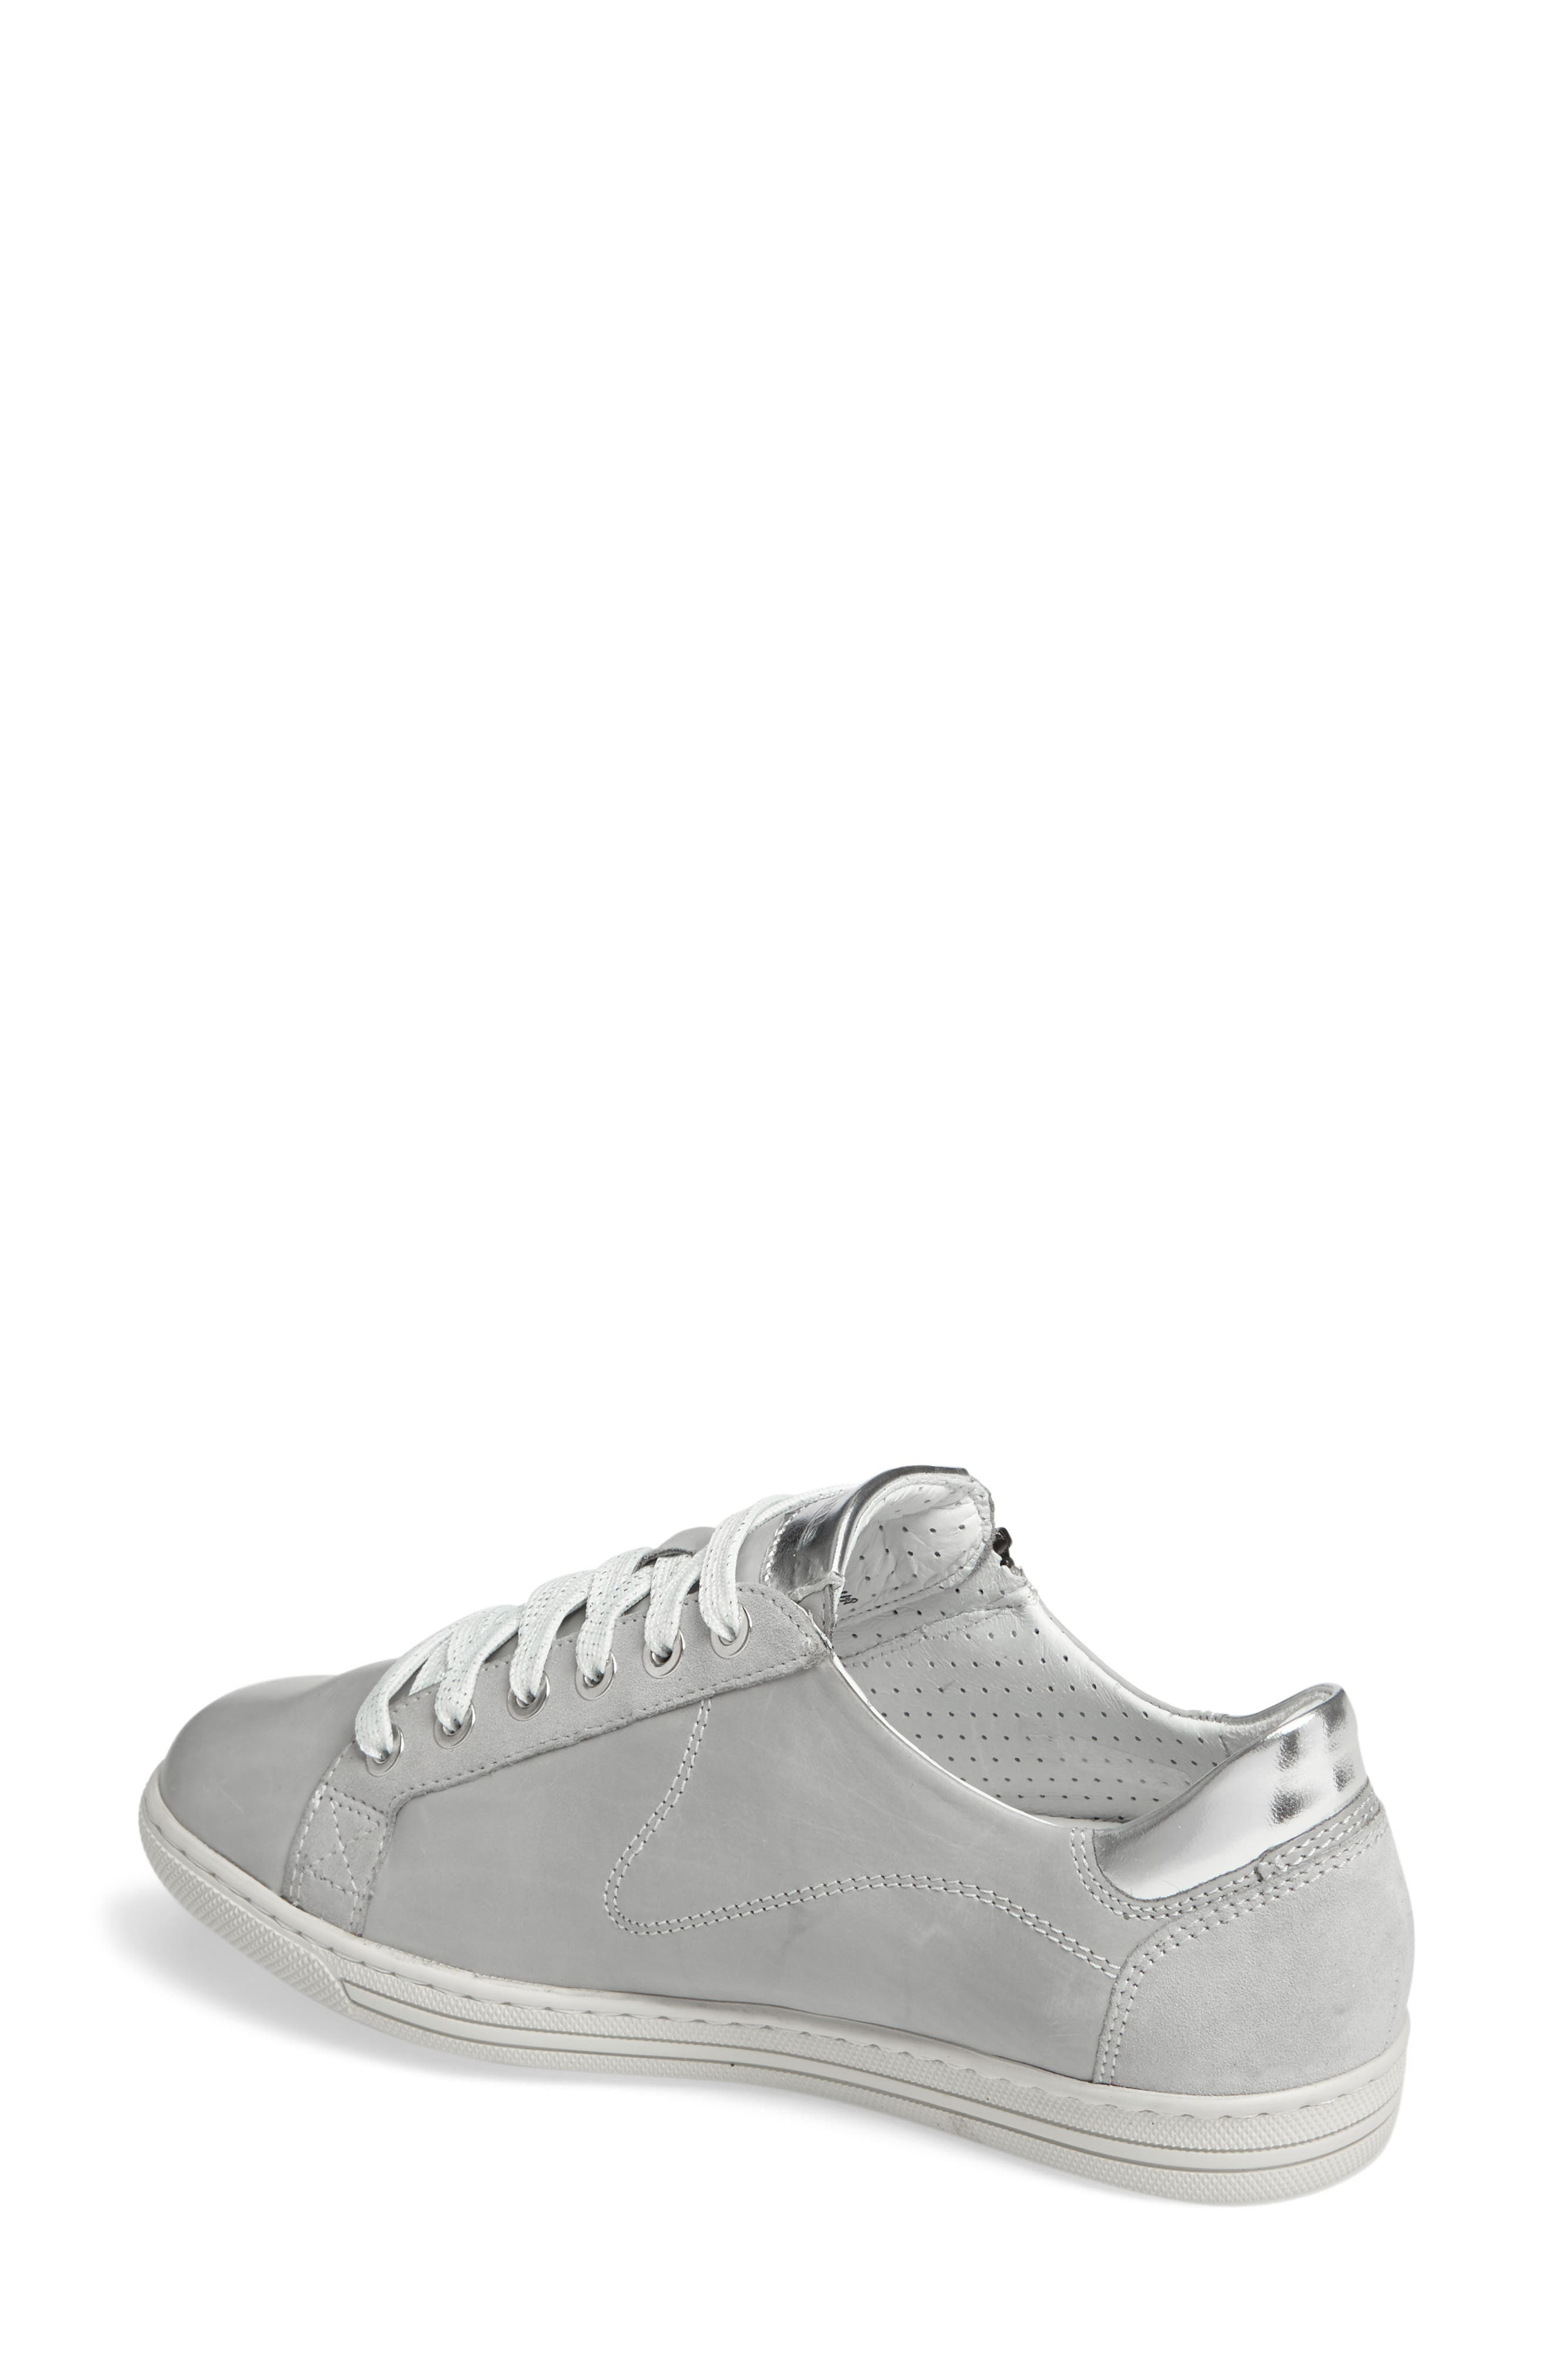 Hawai Sneaker,                             Alternate thumbnail 2, color,                             Light Grey Calfskin Leather